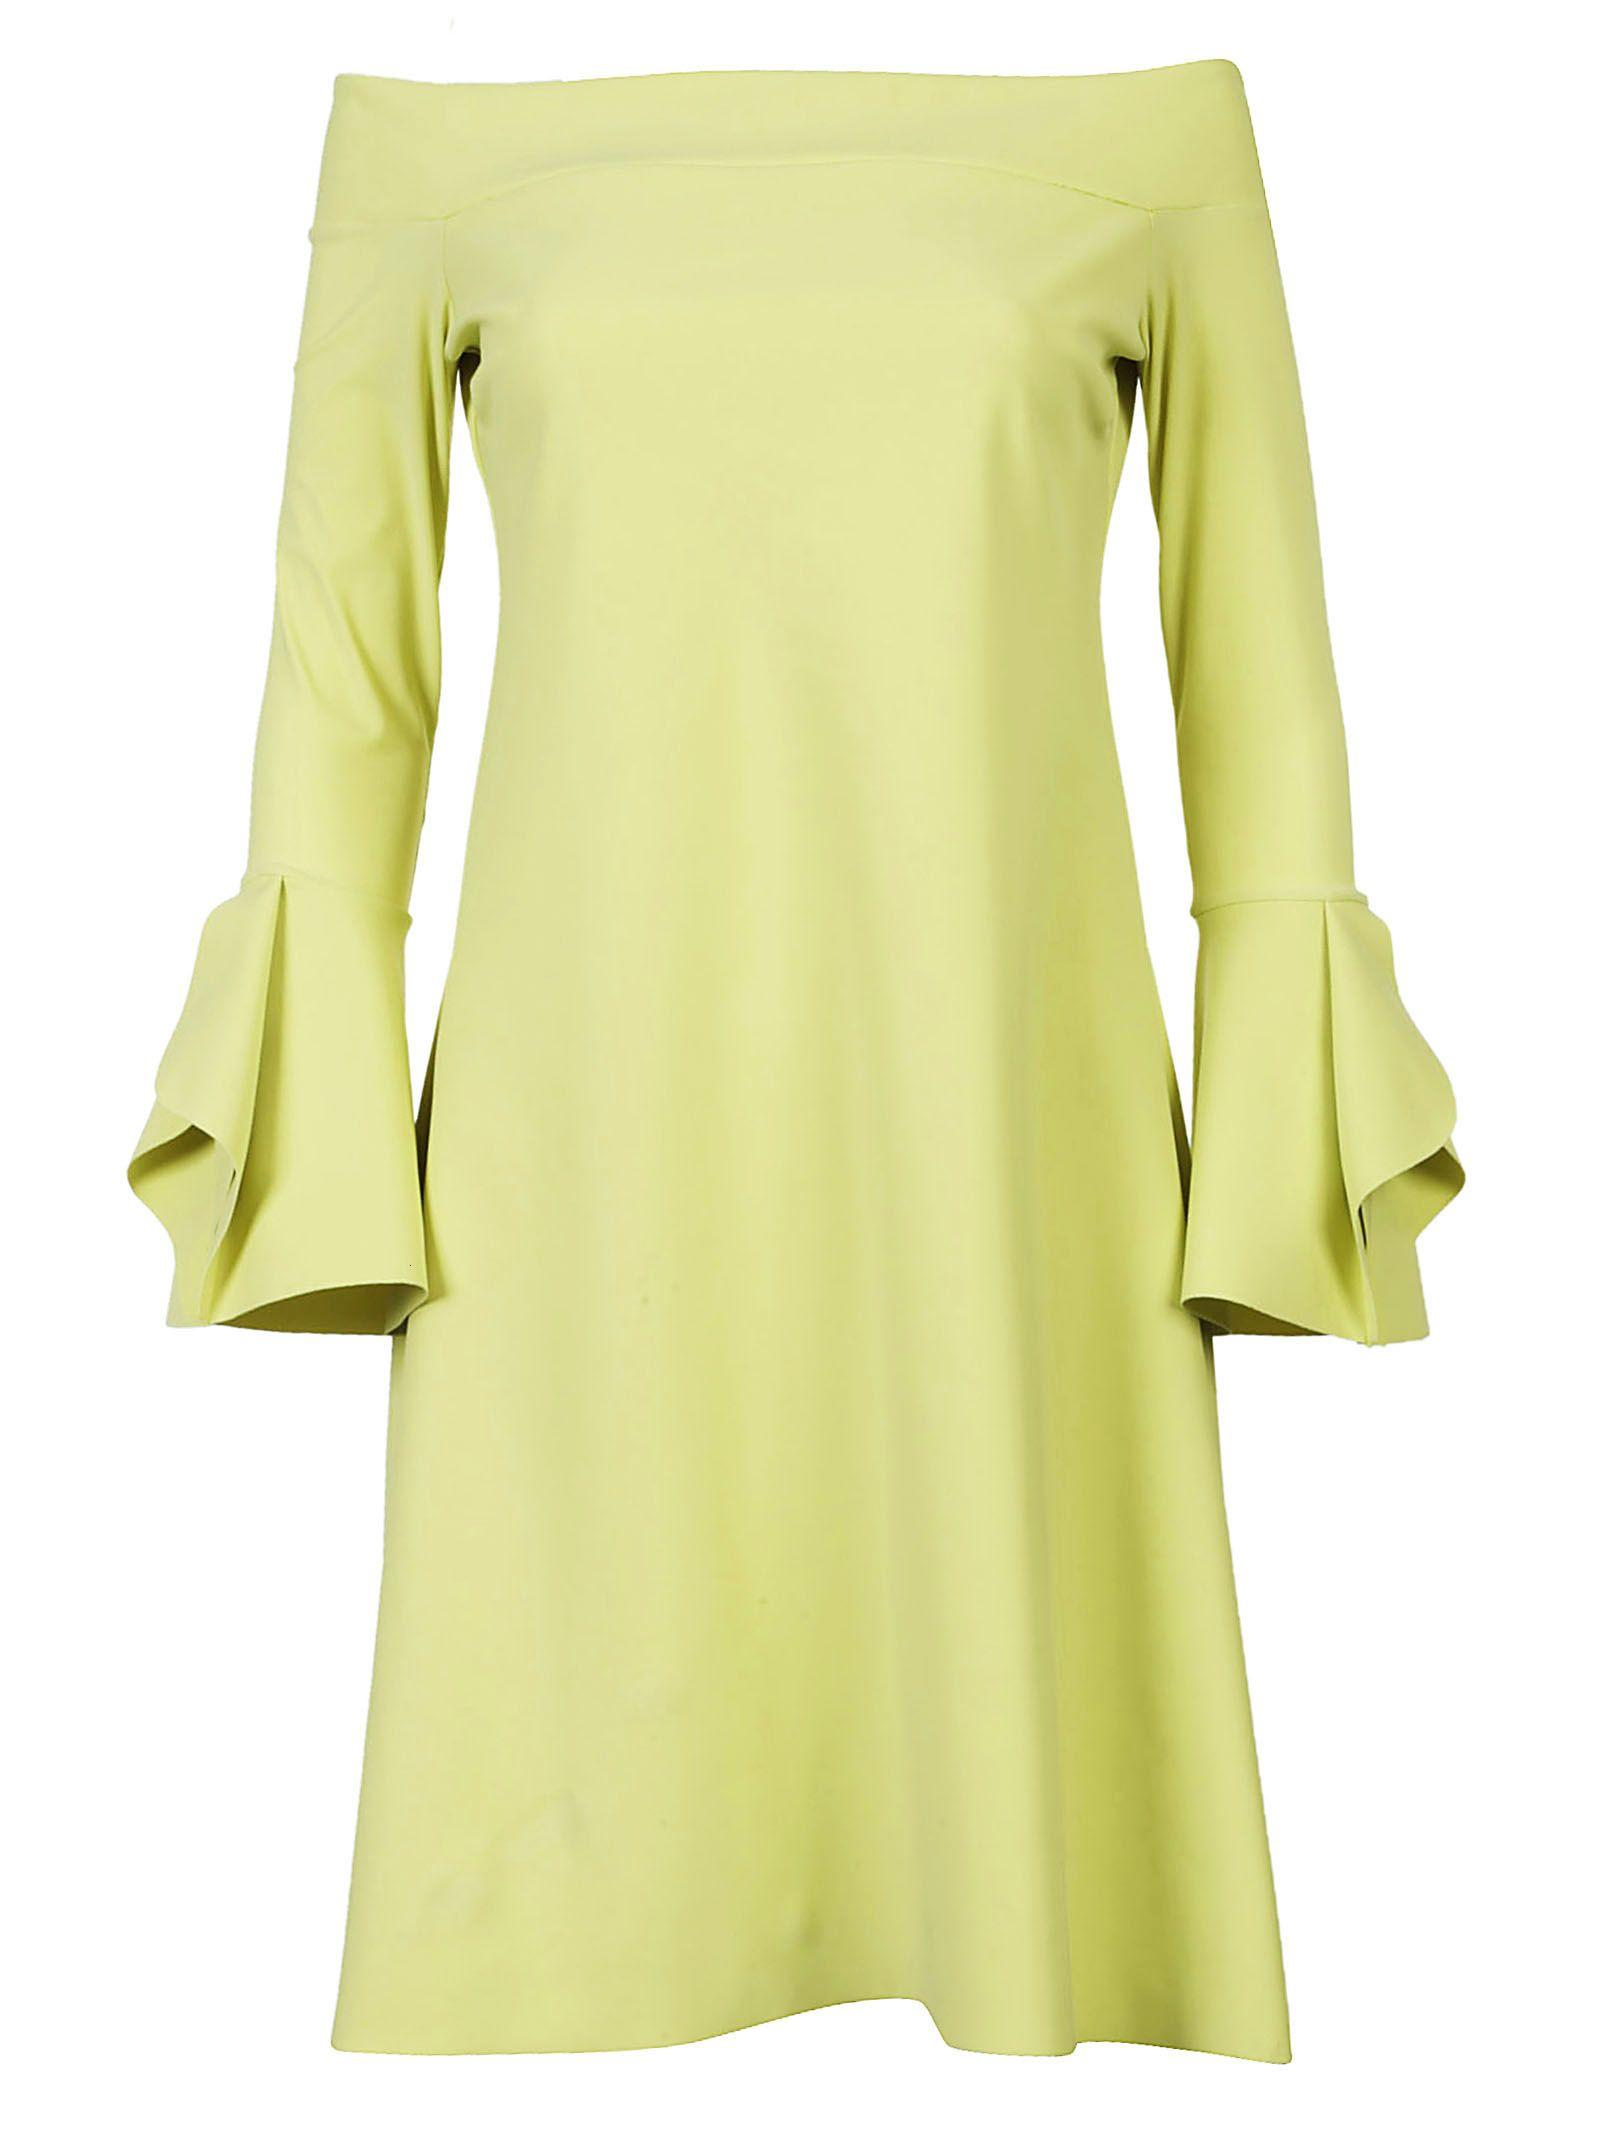 La Petit Robe Di Chiara Boni Chiara Boni Off-the-shoulder Dress In Avocado